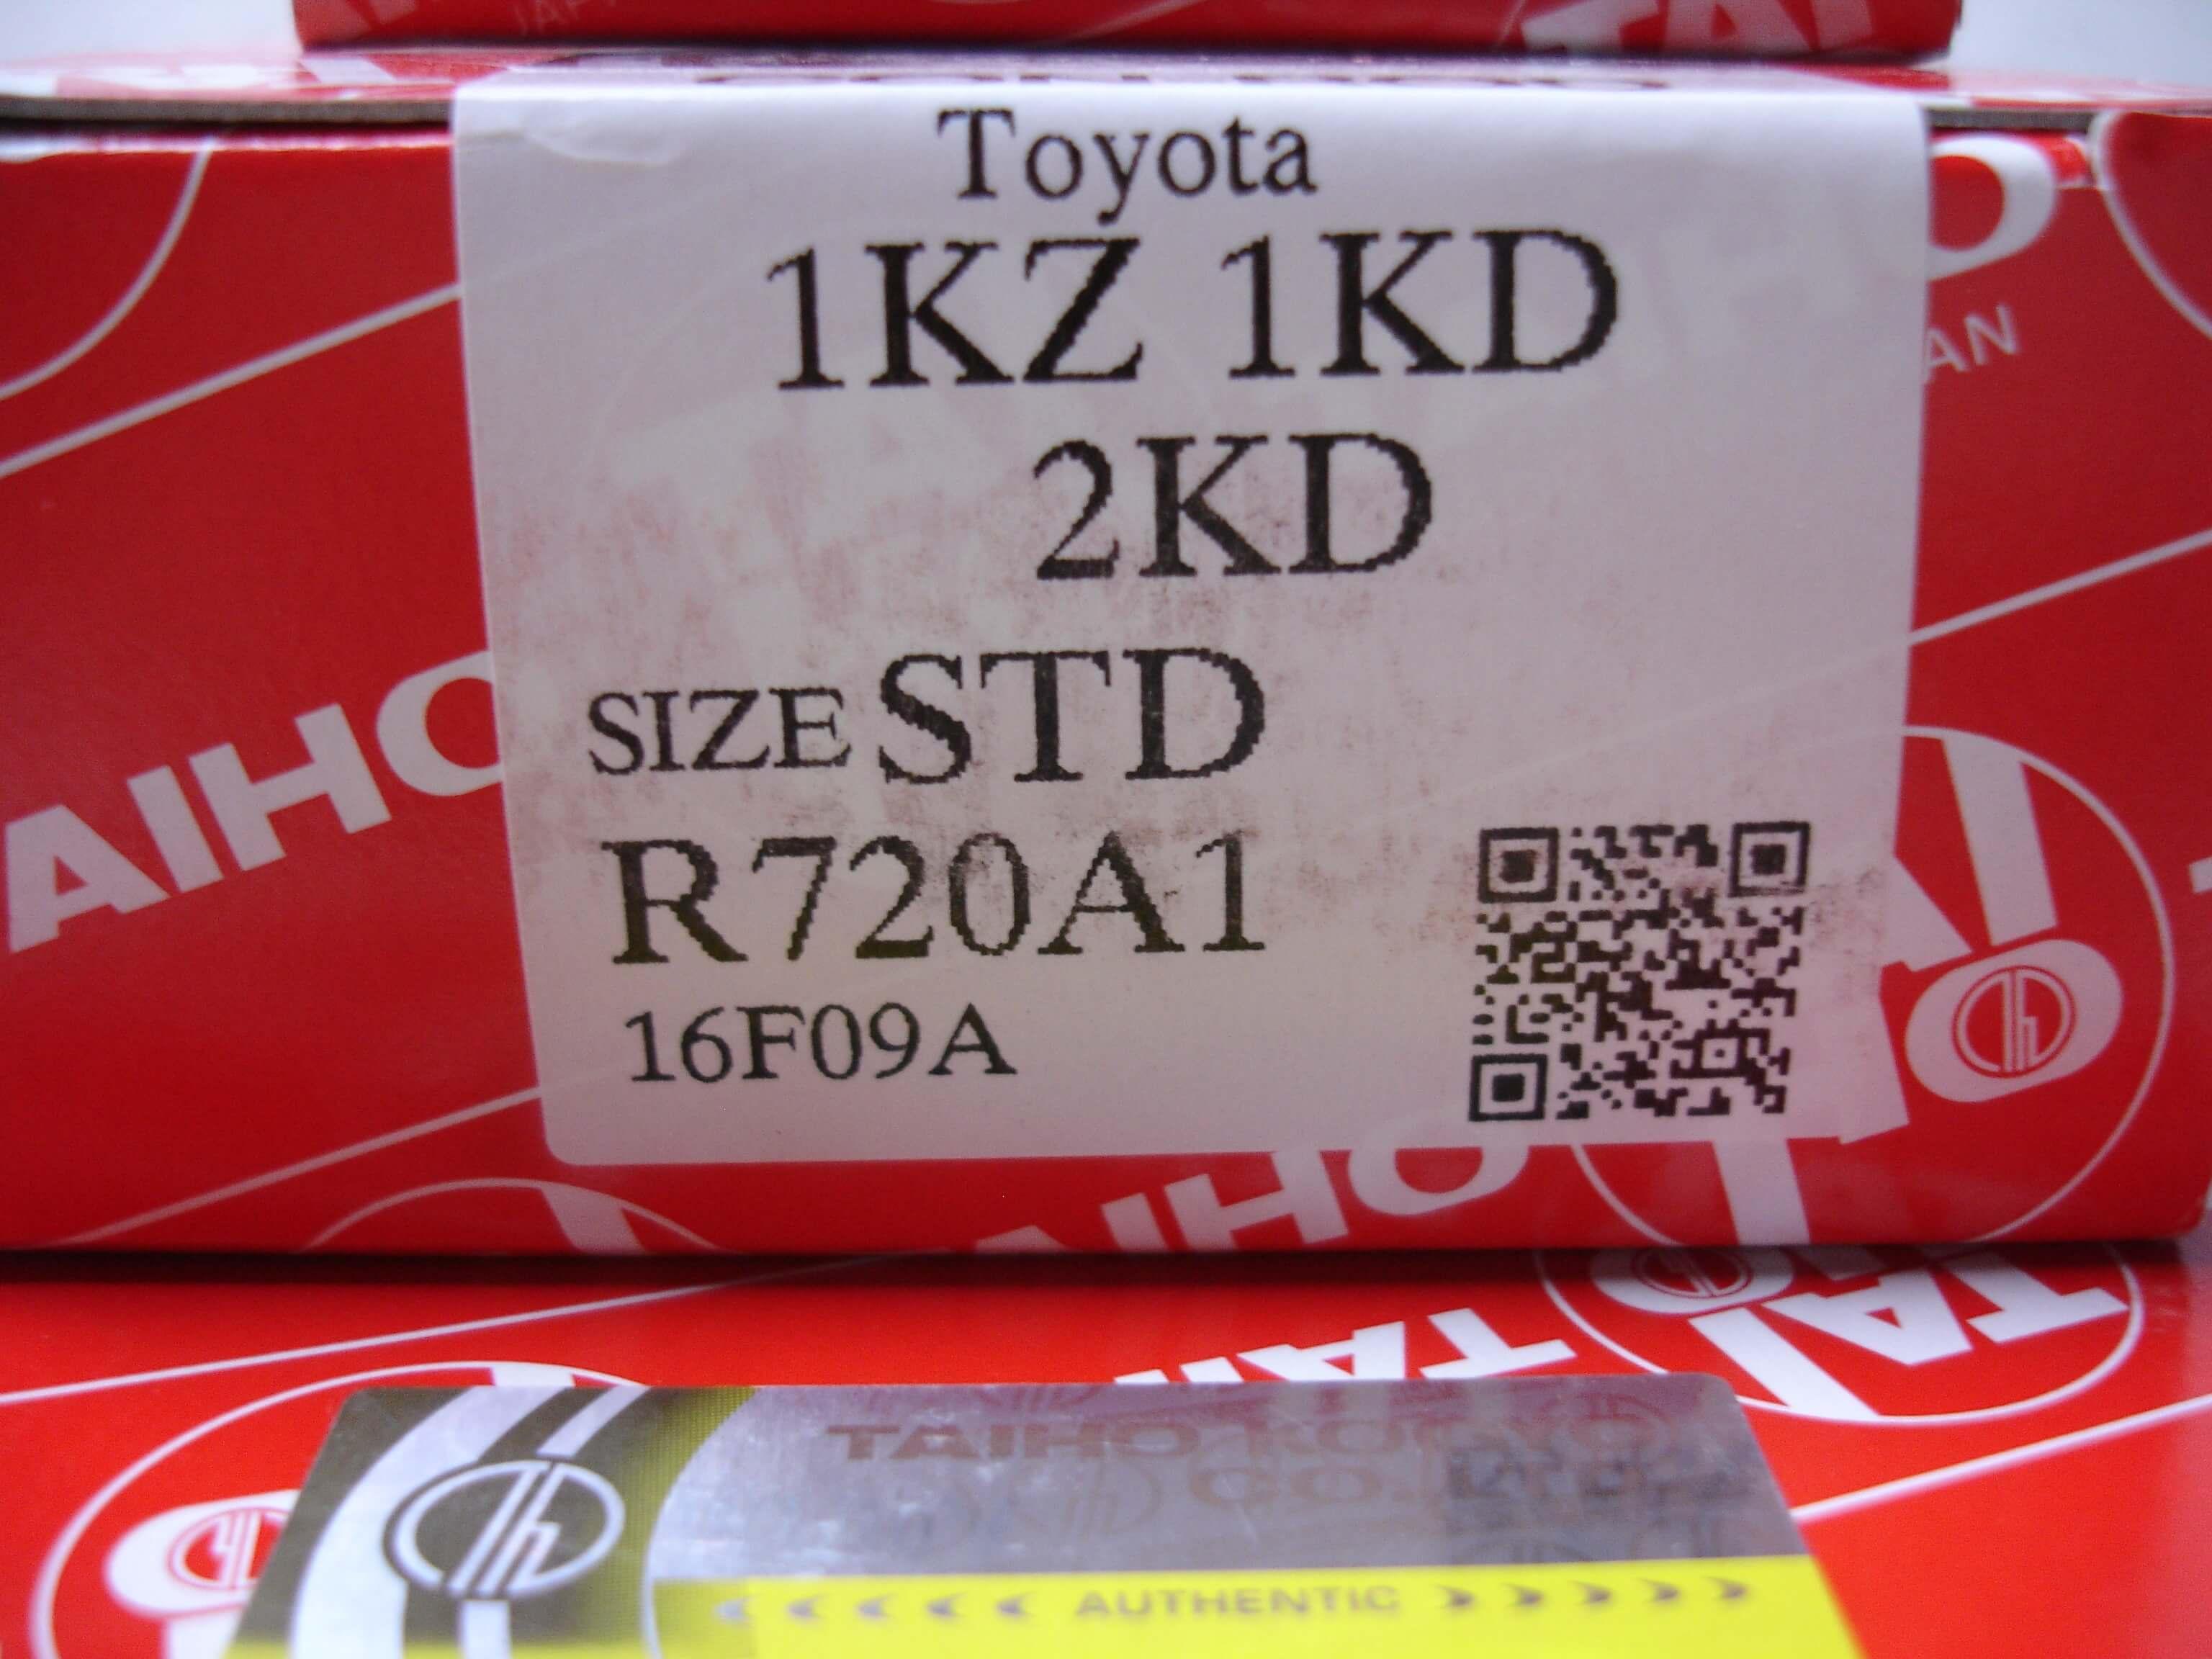 Toyota Genuine TAIHO 1KZ 1KD 2KD Connecting Rod Main Thrust Bearings STD Size